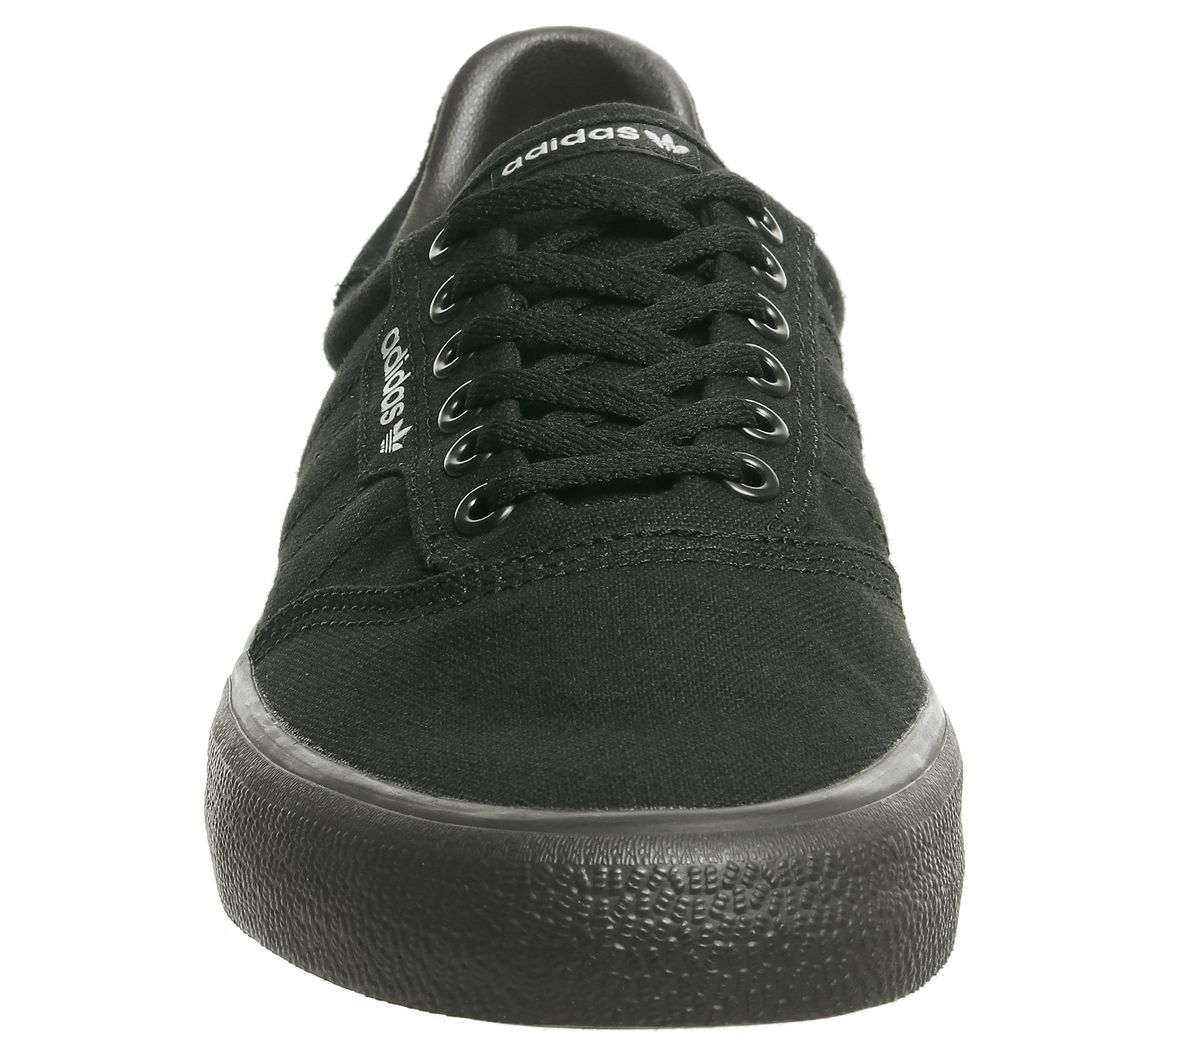 ea206bb7e631b7 Sentinel Adidas 3Mc Trainers Core Black Core Black Grey Trainers Shoes